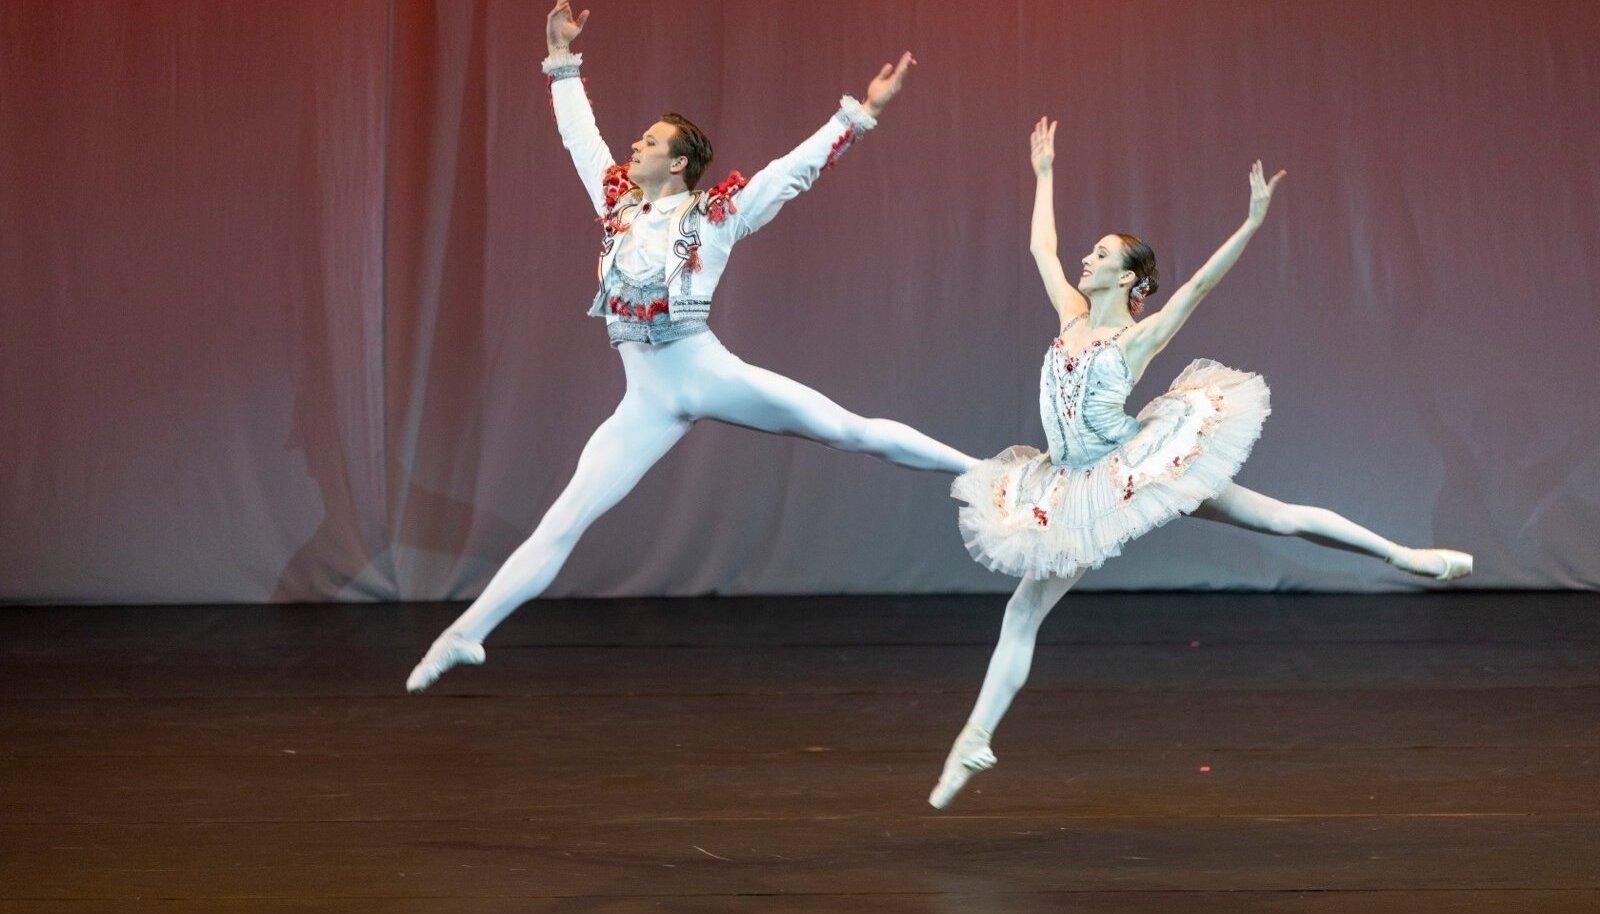 Birgitta festivali balletigala